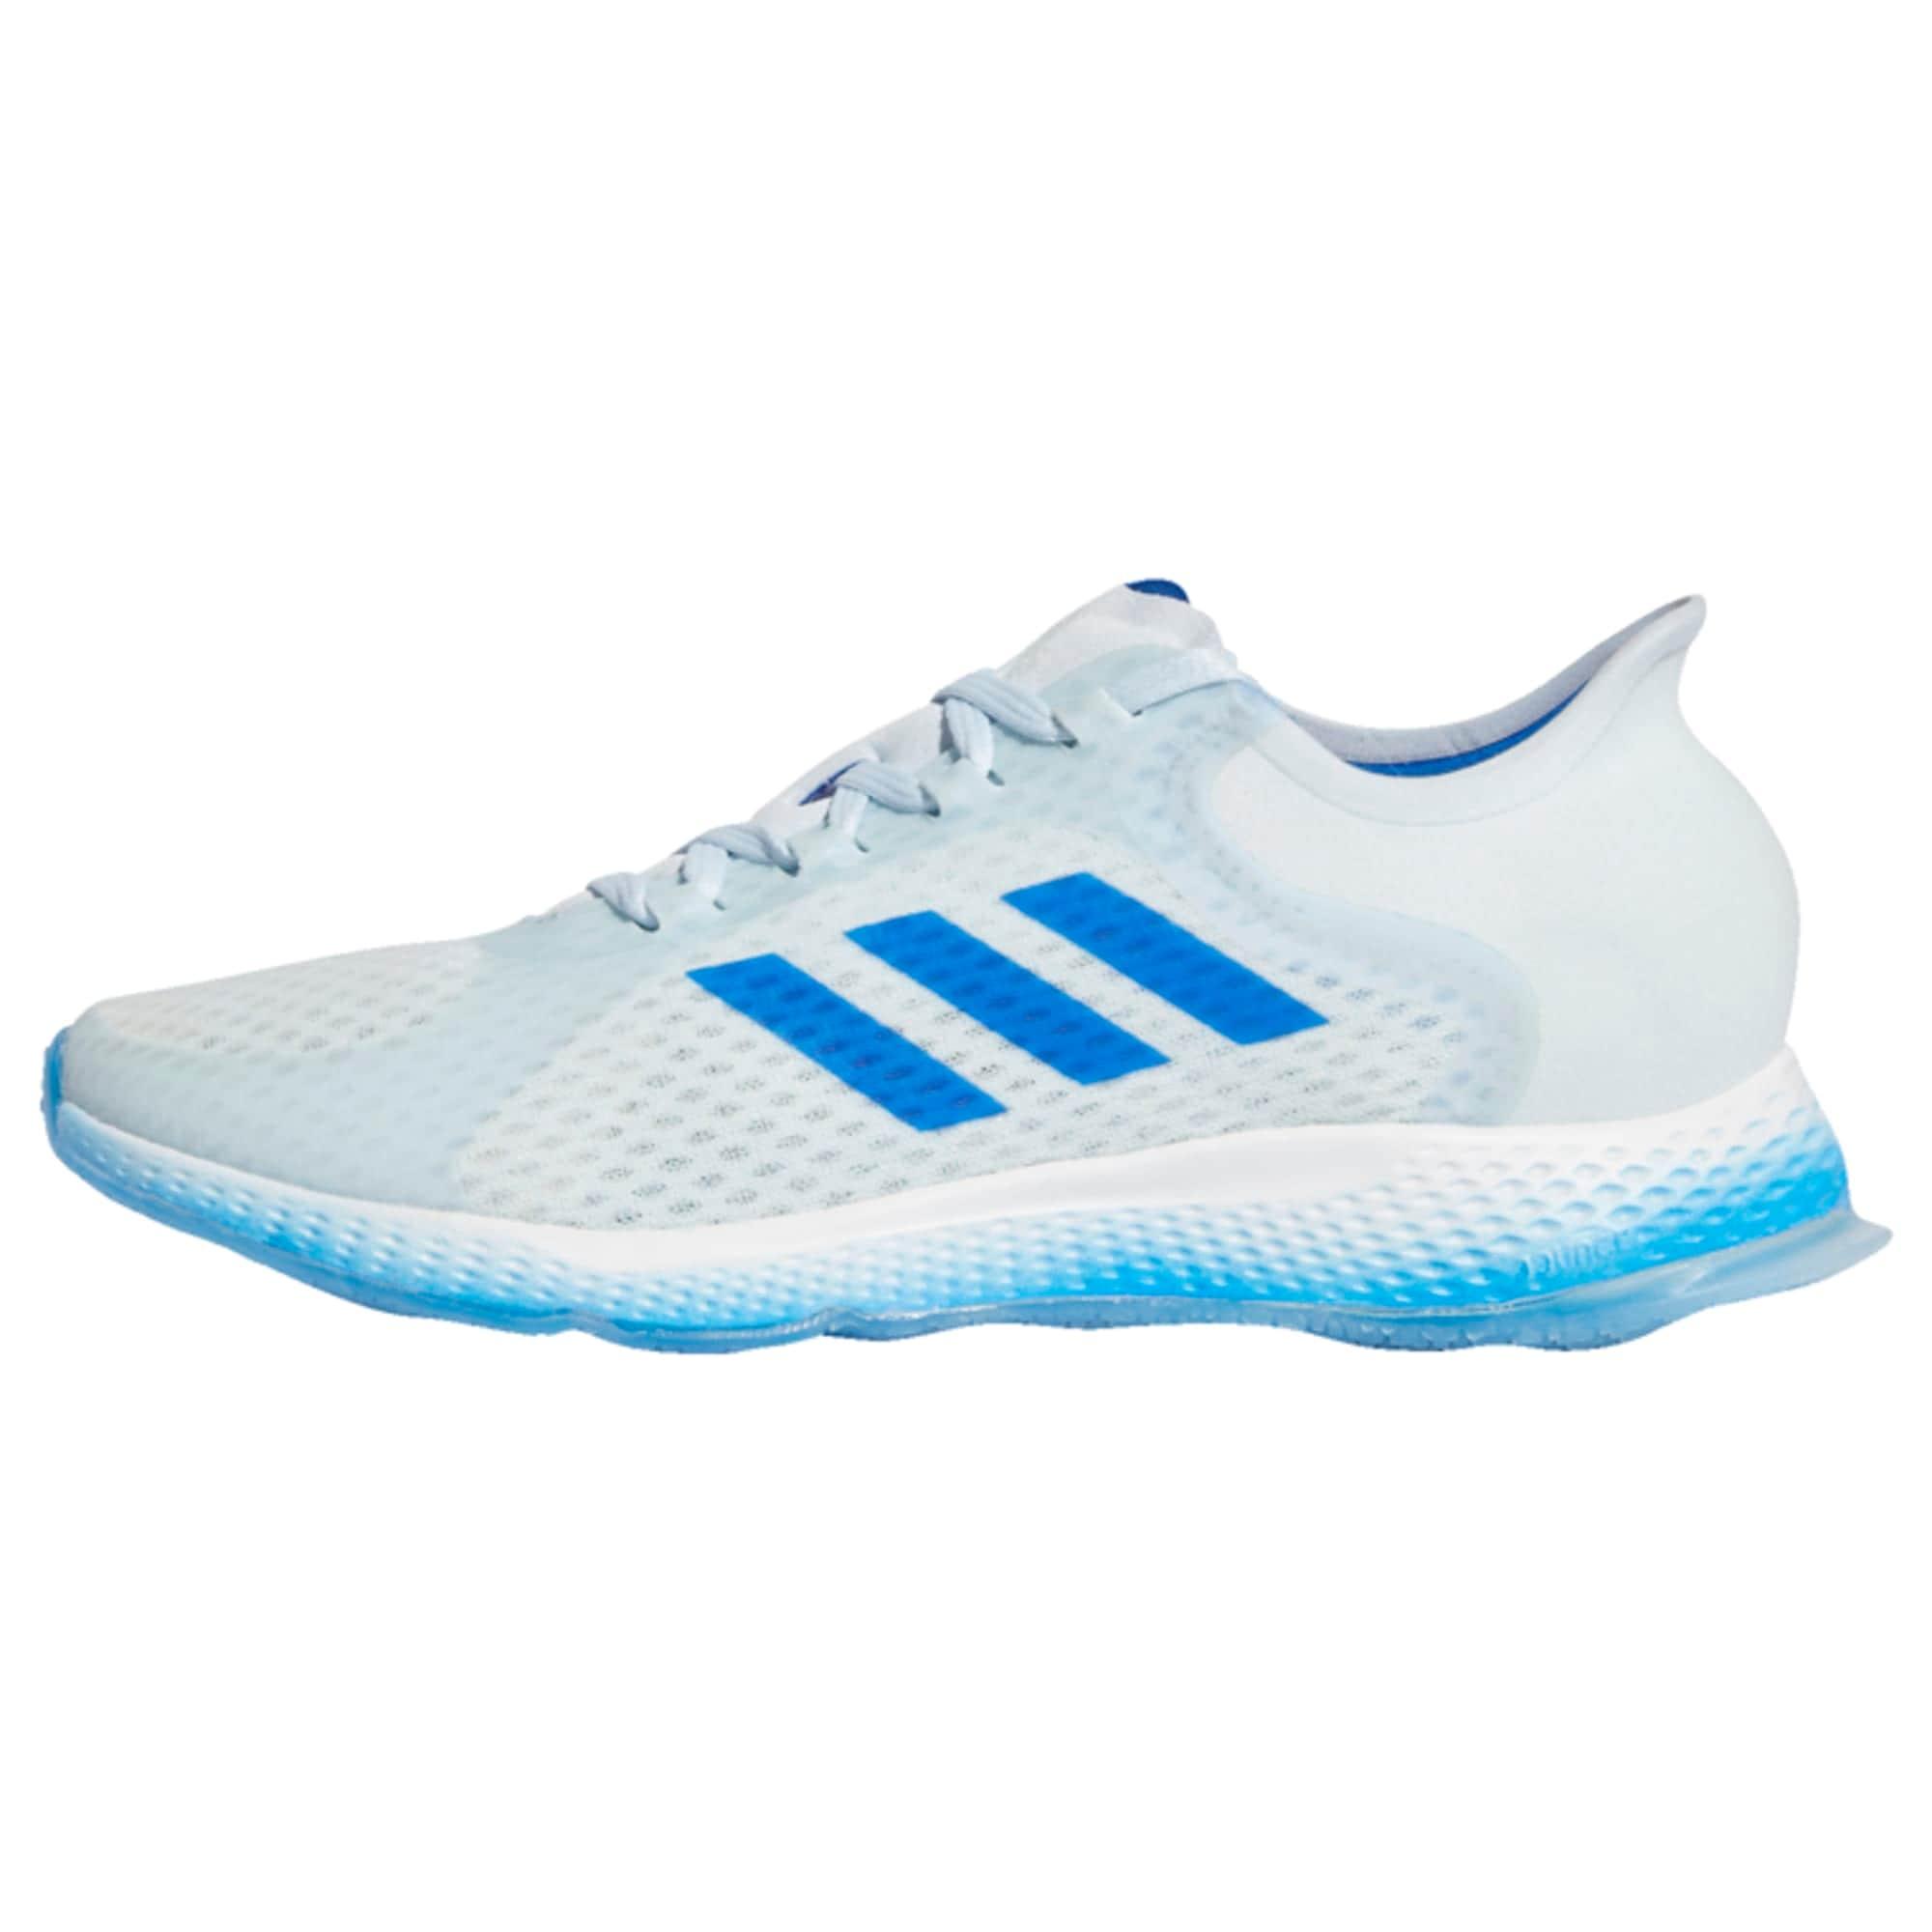 ADIDAS PERFORMANCE Futócipők  kék / fehér